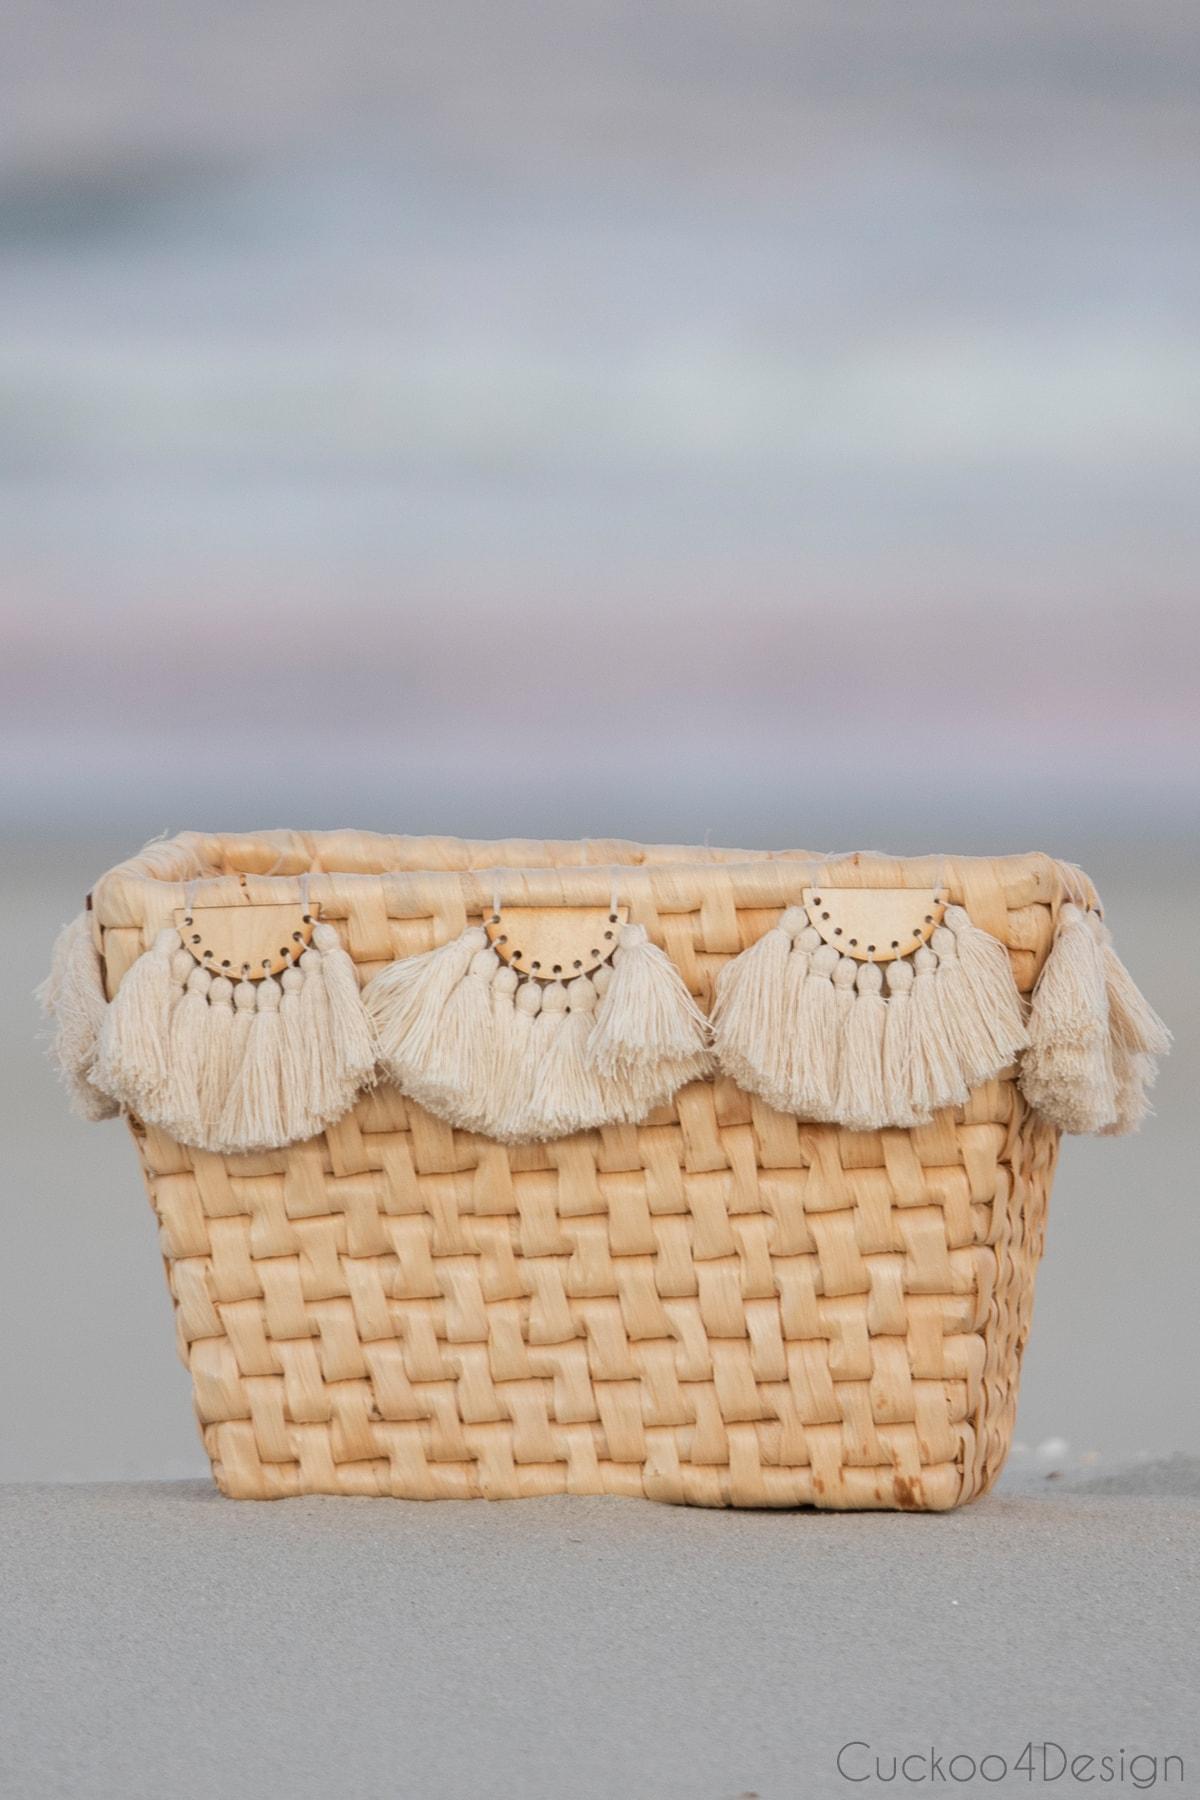 finished basket with half-moon tassel embellishments